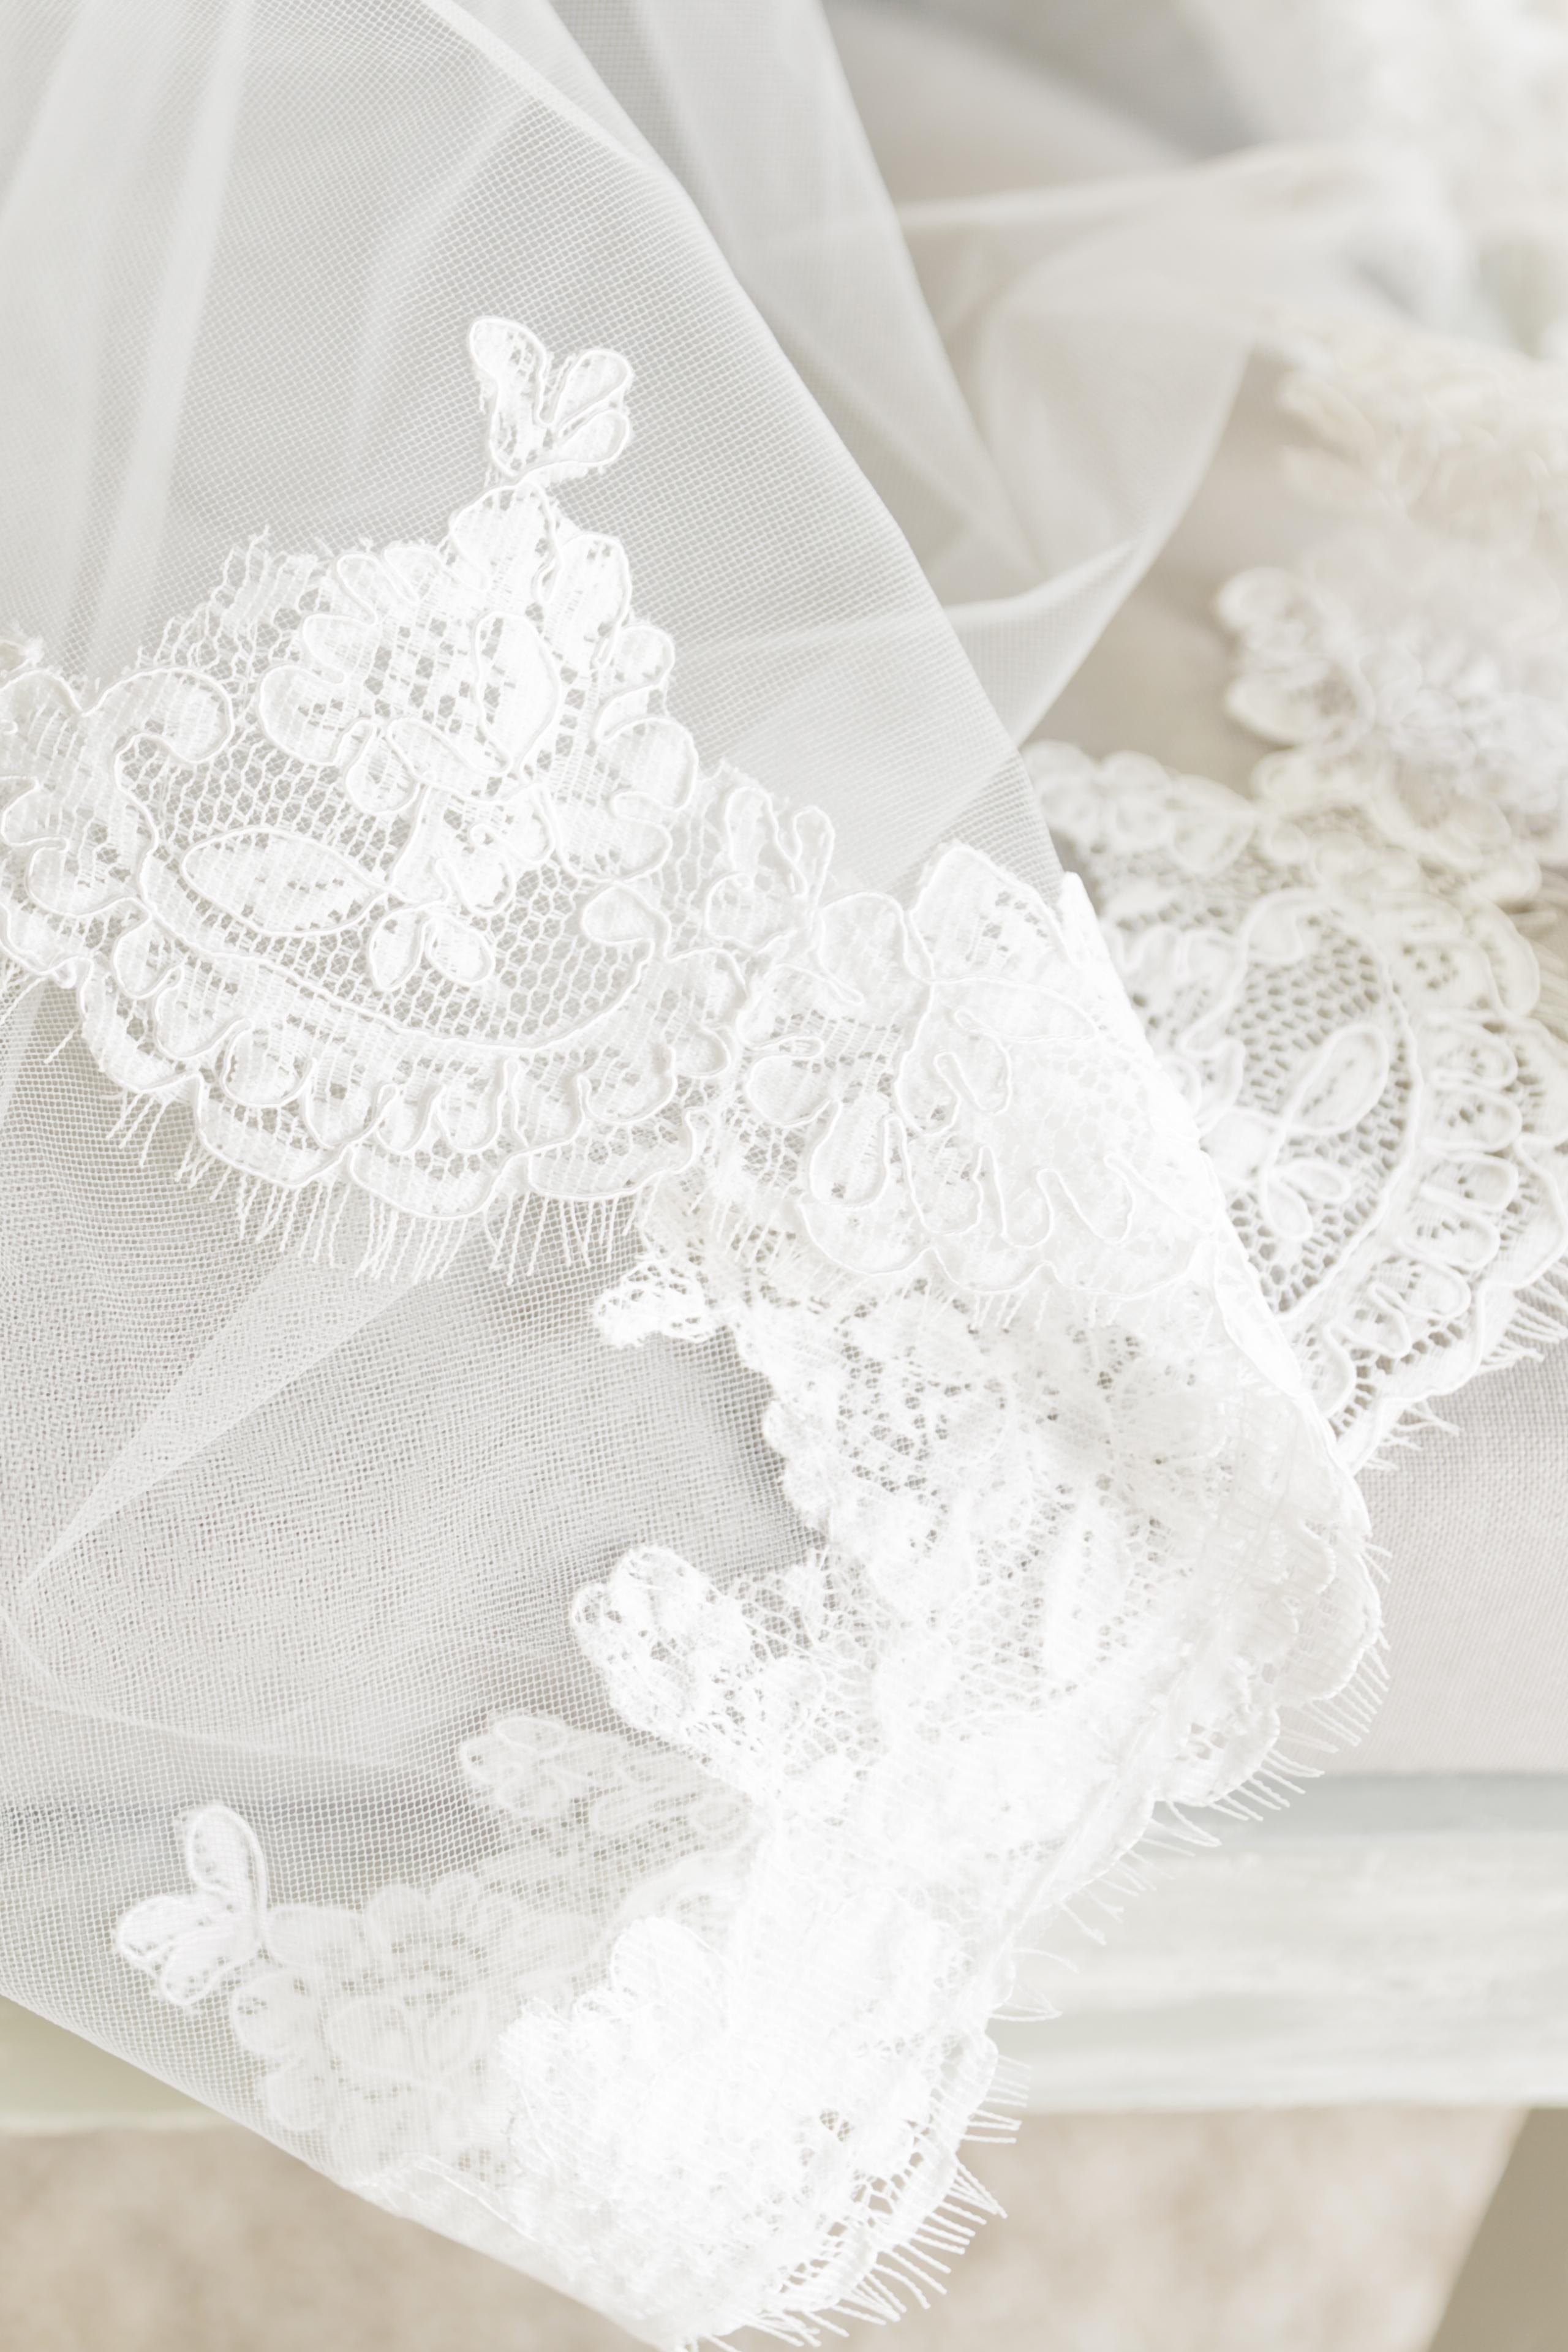 Mariage robe voile mariée